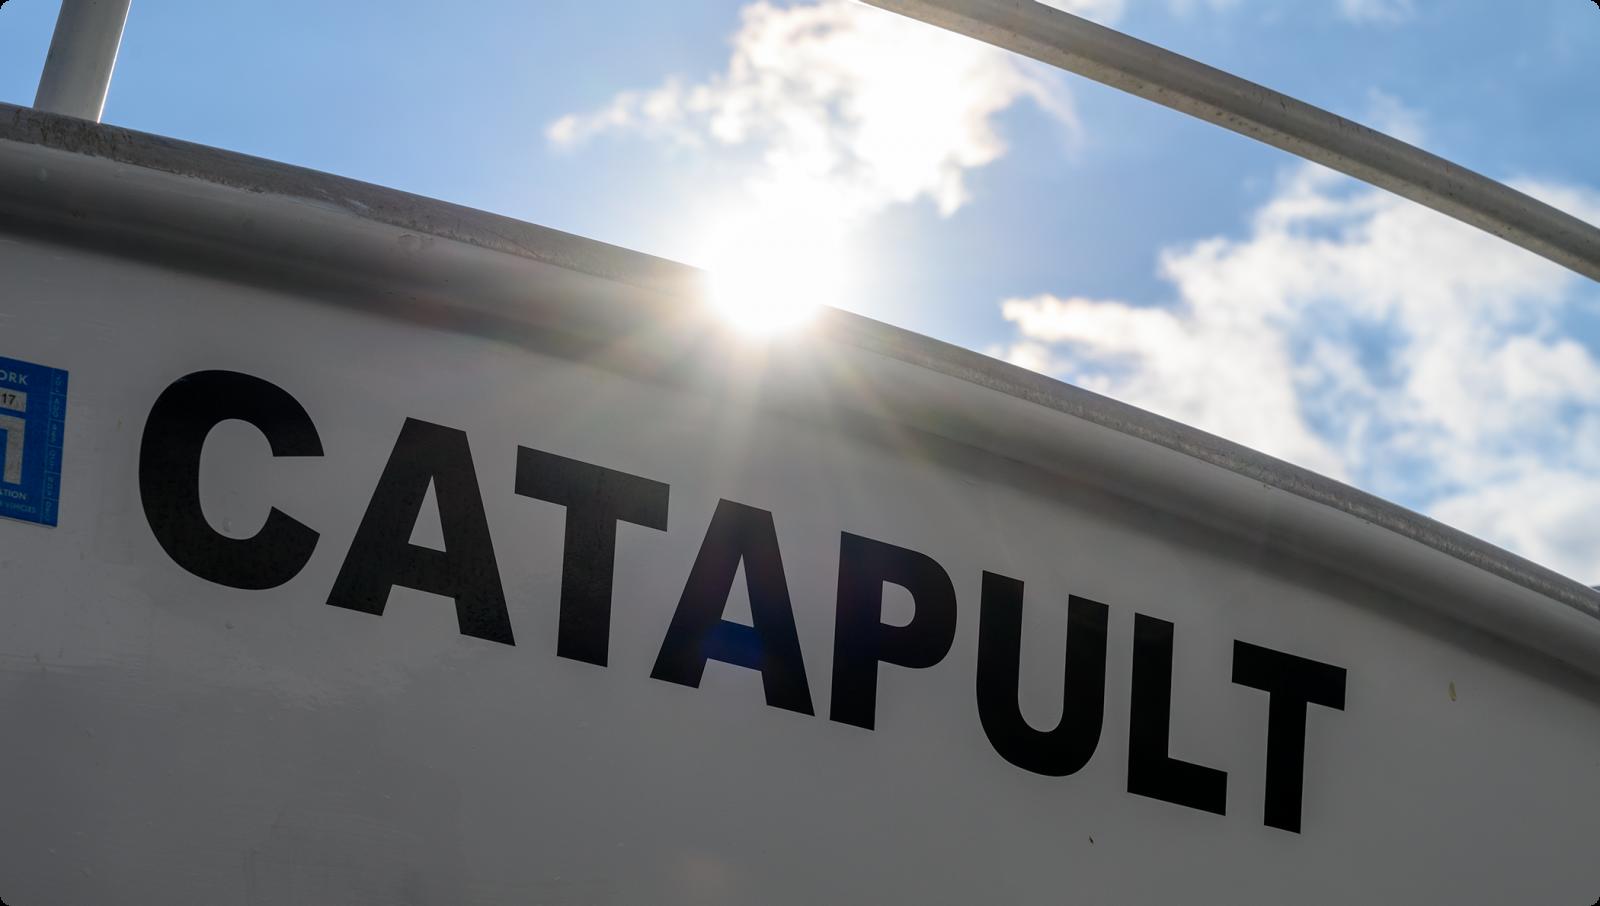 Catapult-name